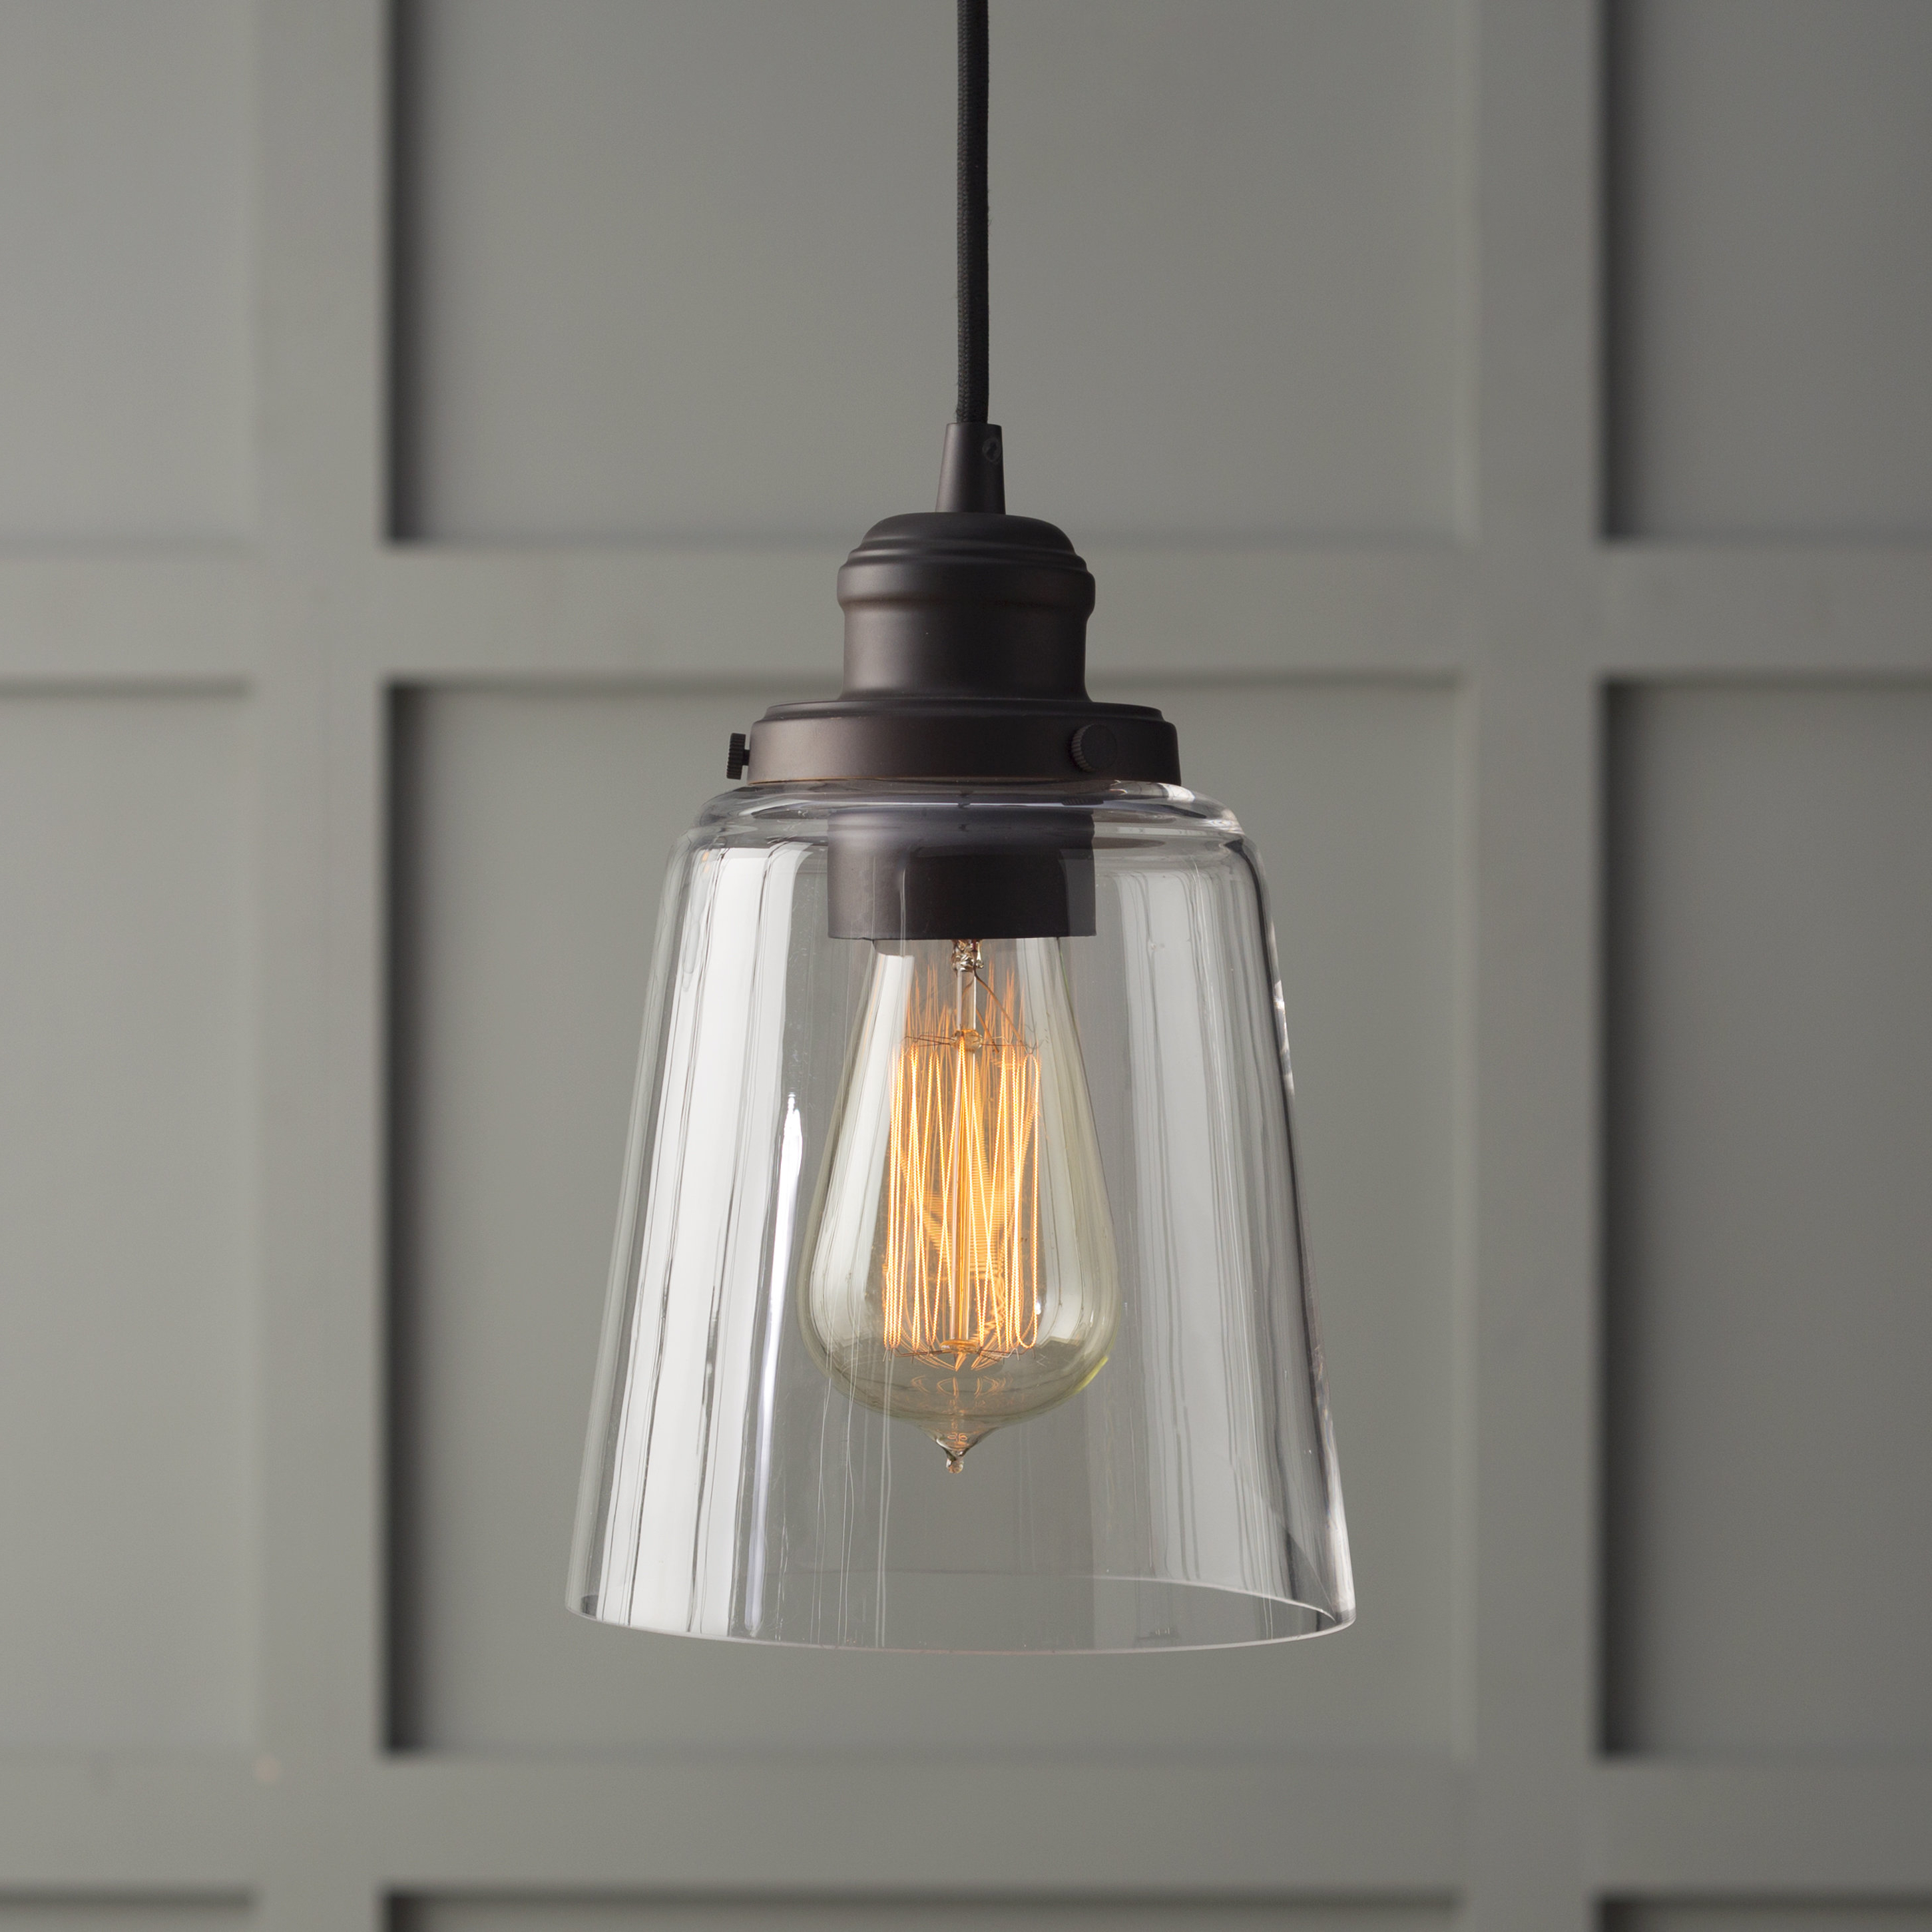 Roslindale 1 Light Single Bell Pendants With Regard To Famous 1 Light Single Bell Pendant (View 7 of 20)